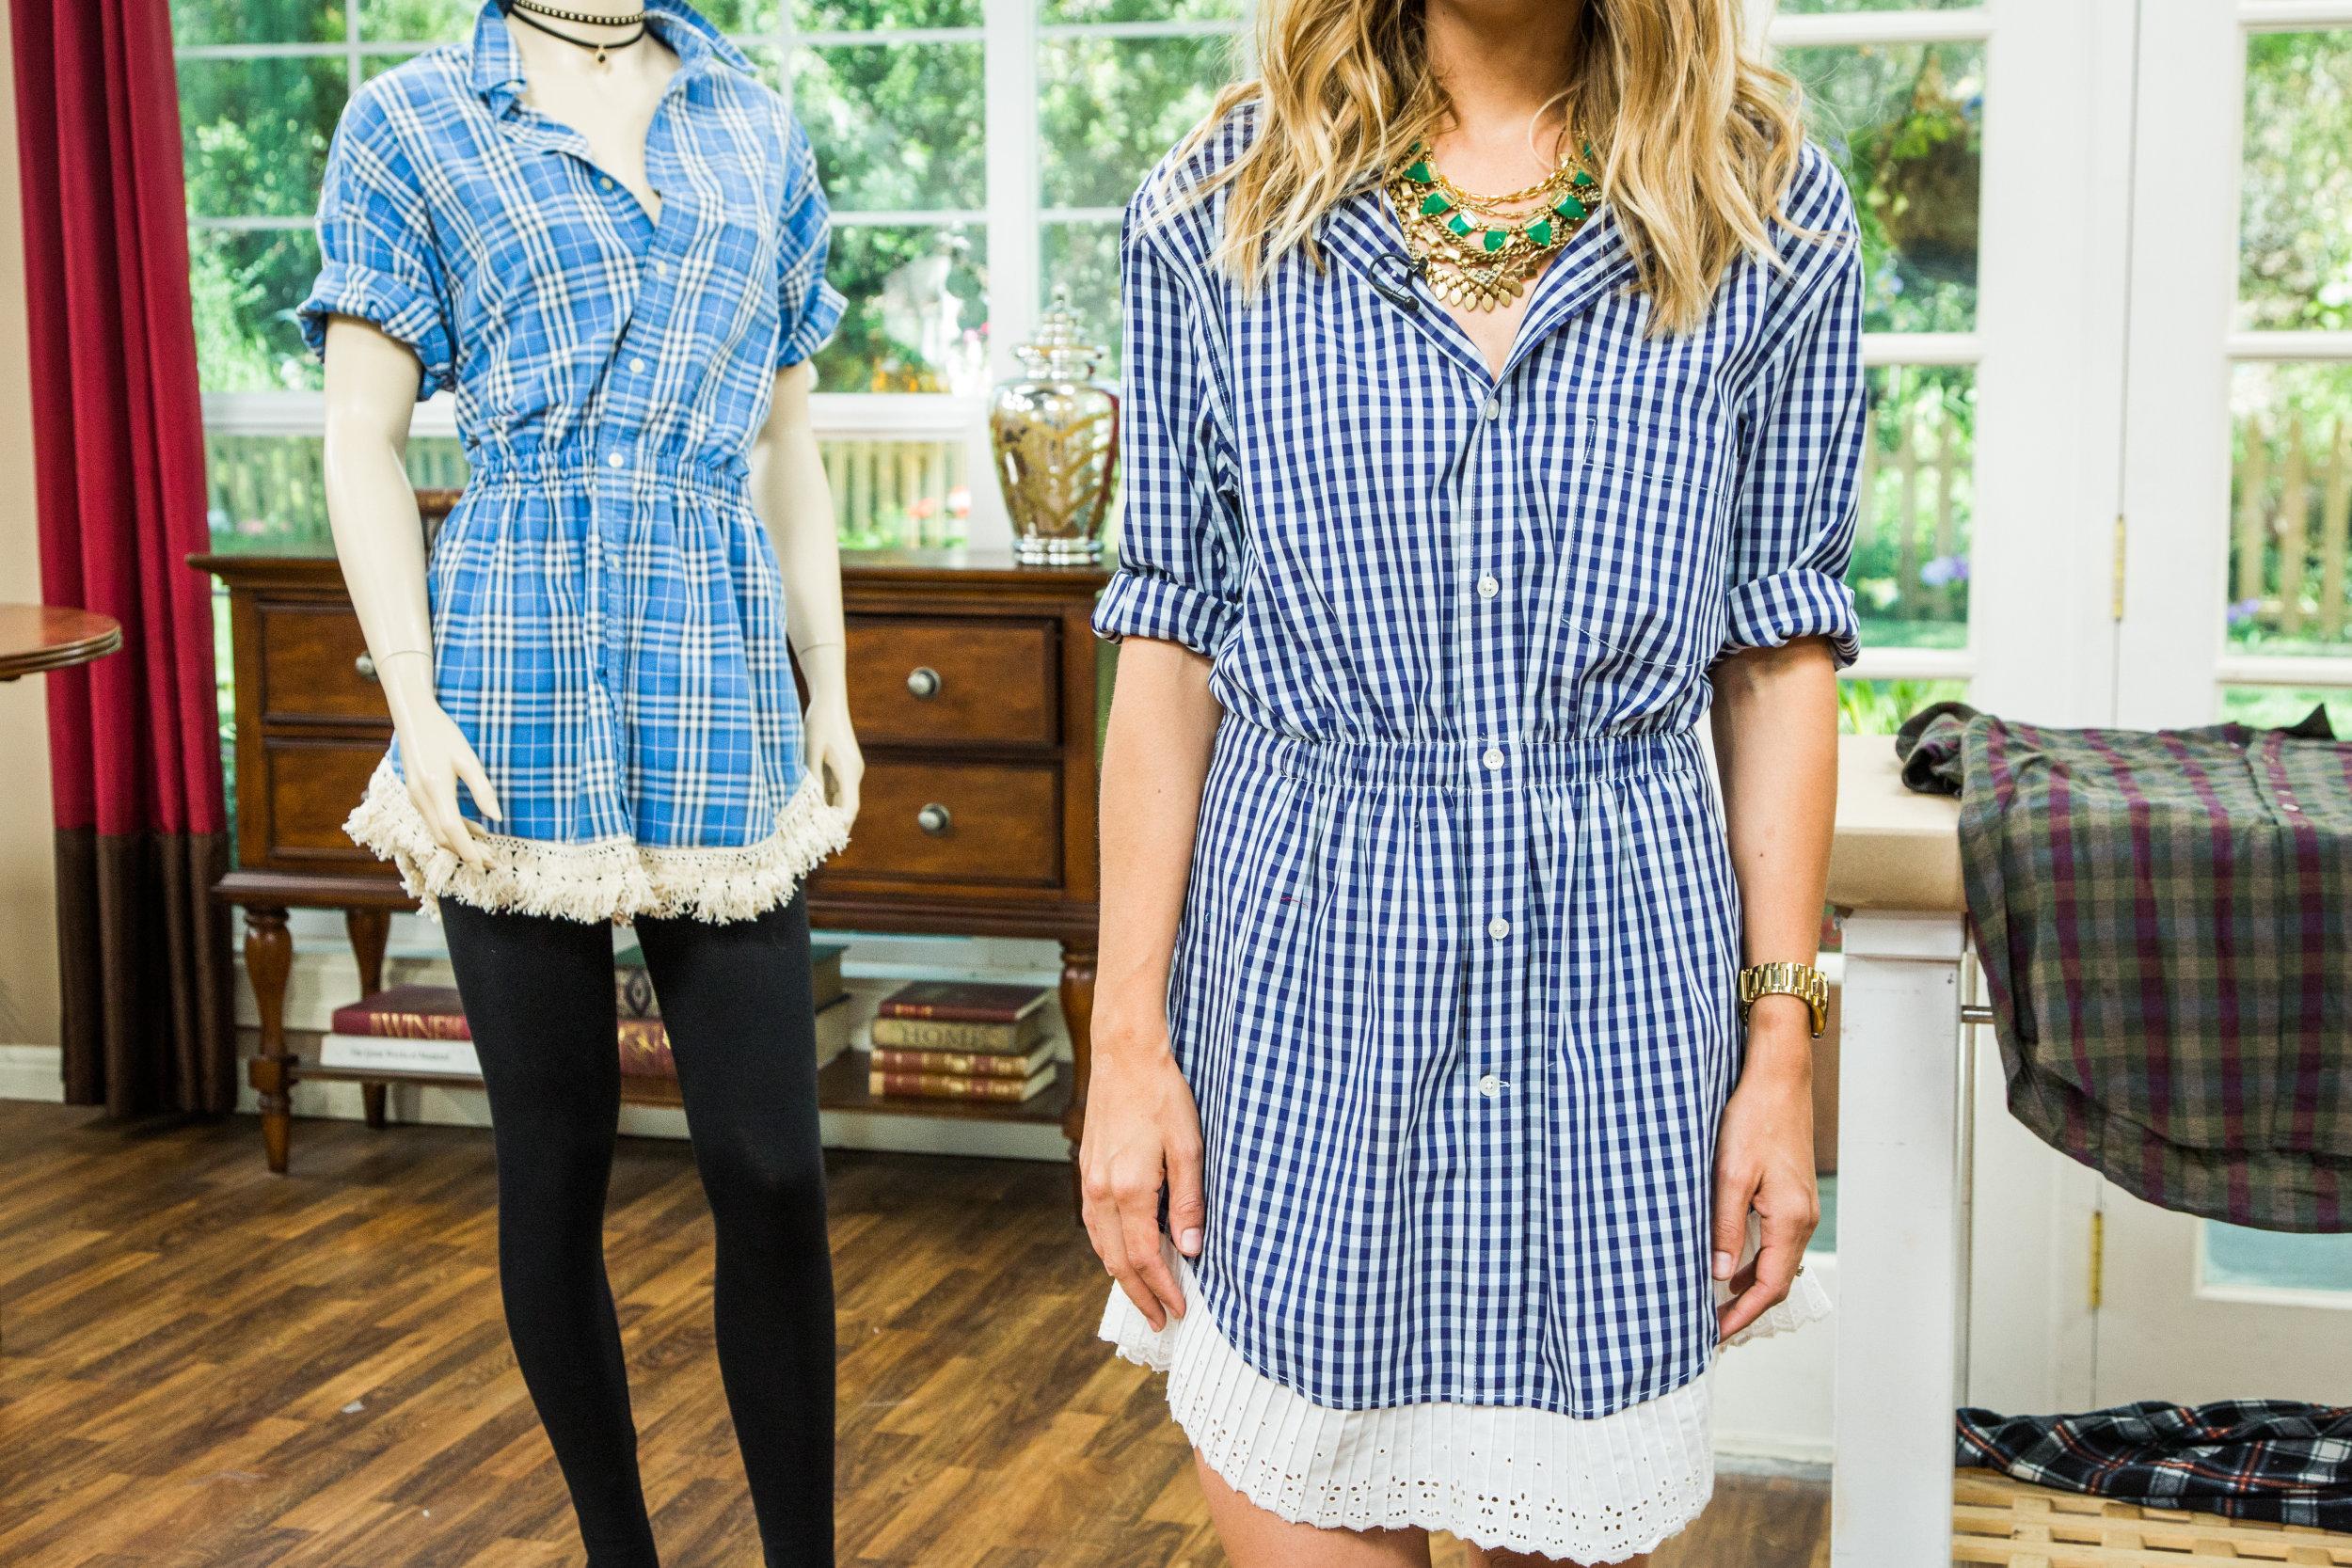 How To - Home & Family: DIY Shirt Dress   Hallmark Channel